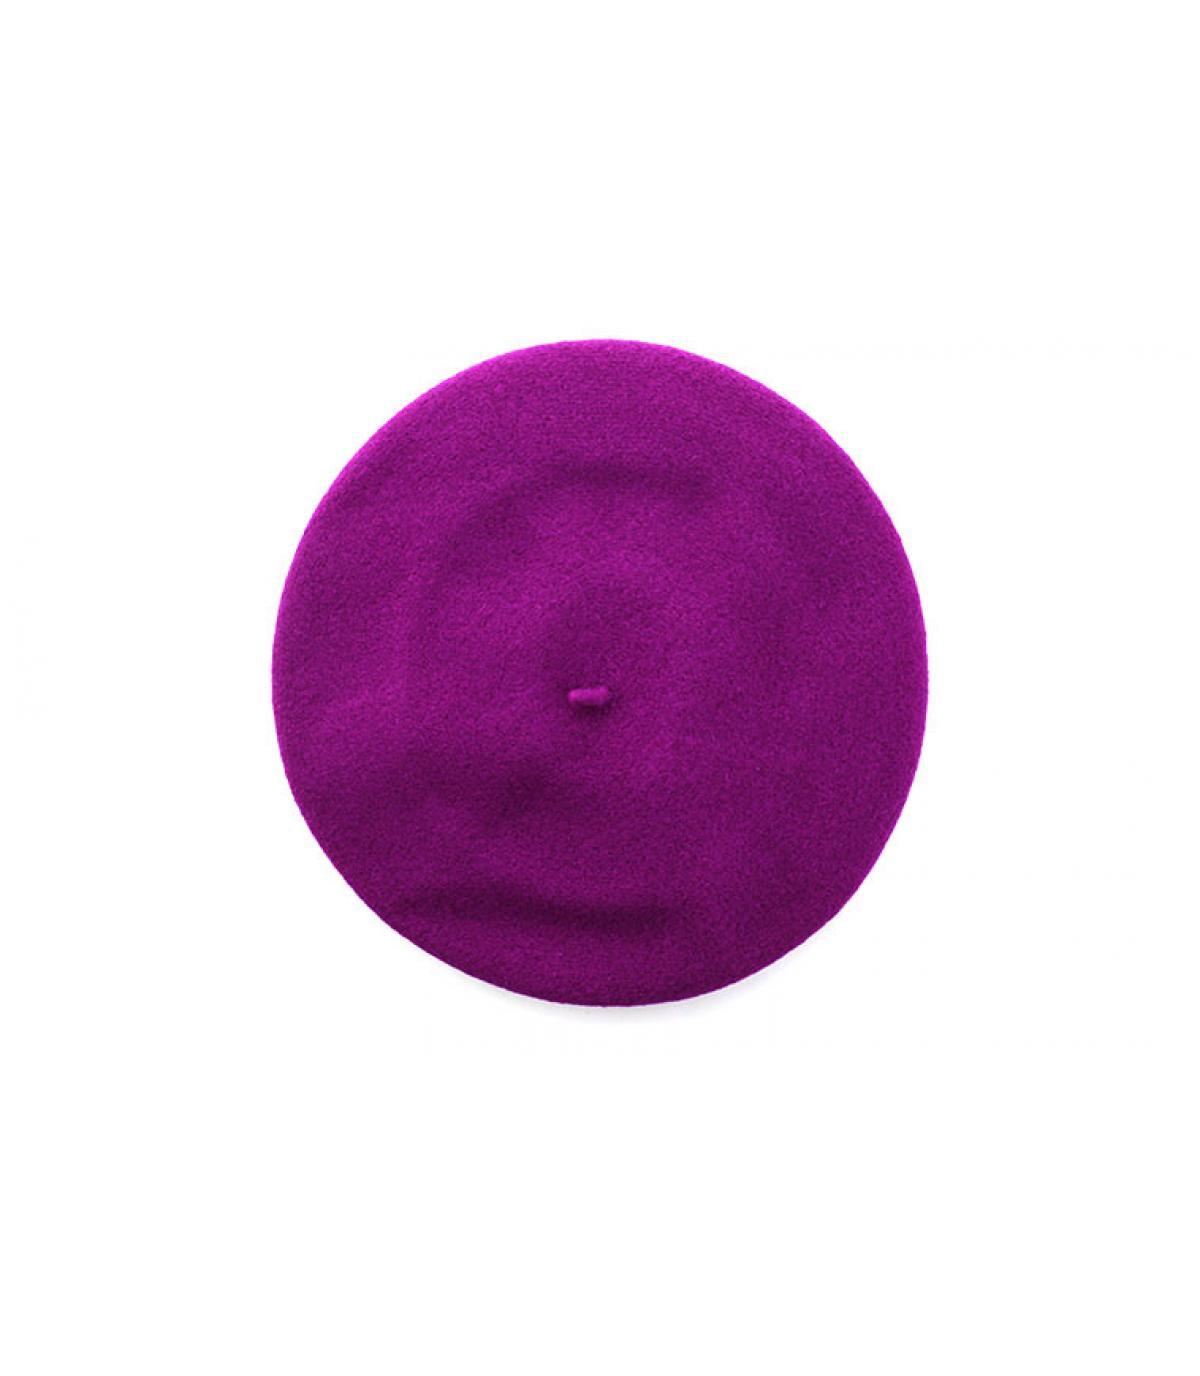 Dettagli Parisienne purple - image 2